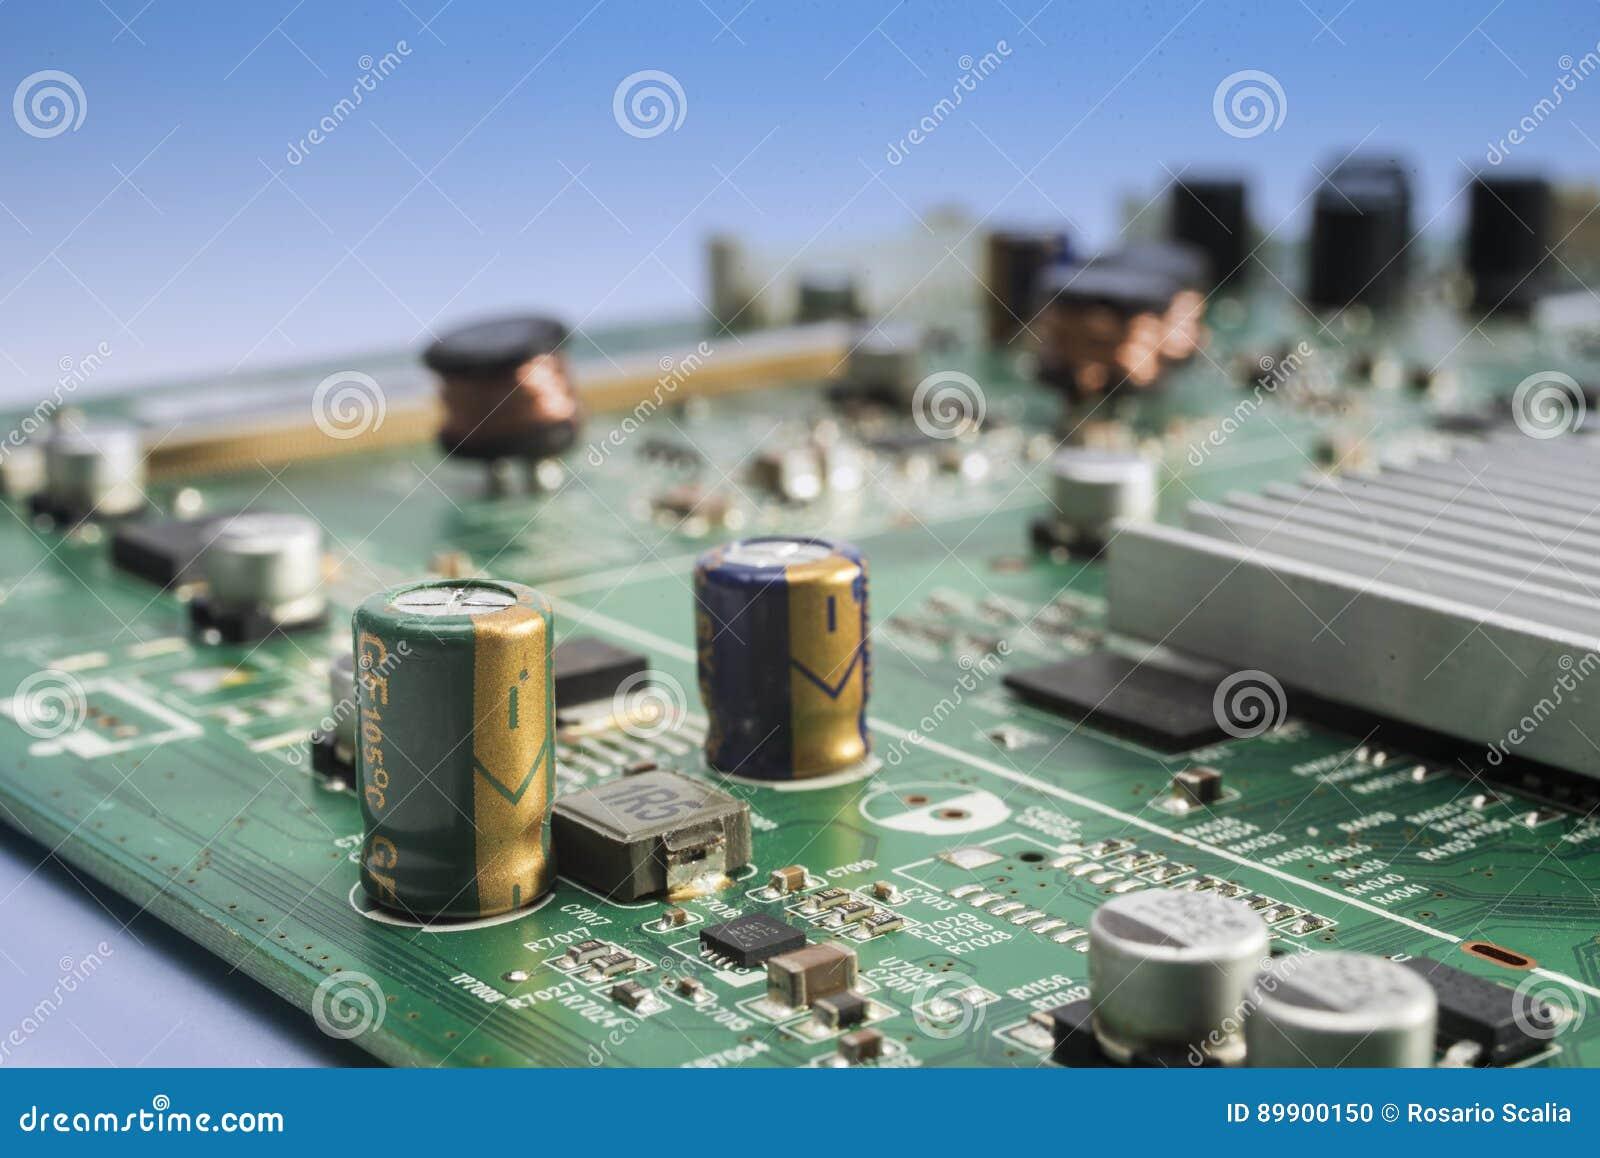 Elektronisk strömkrets